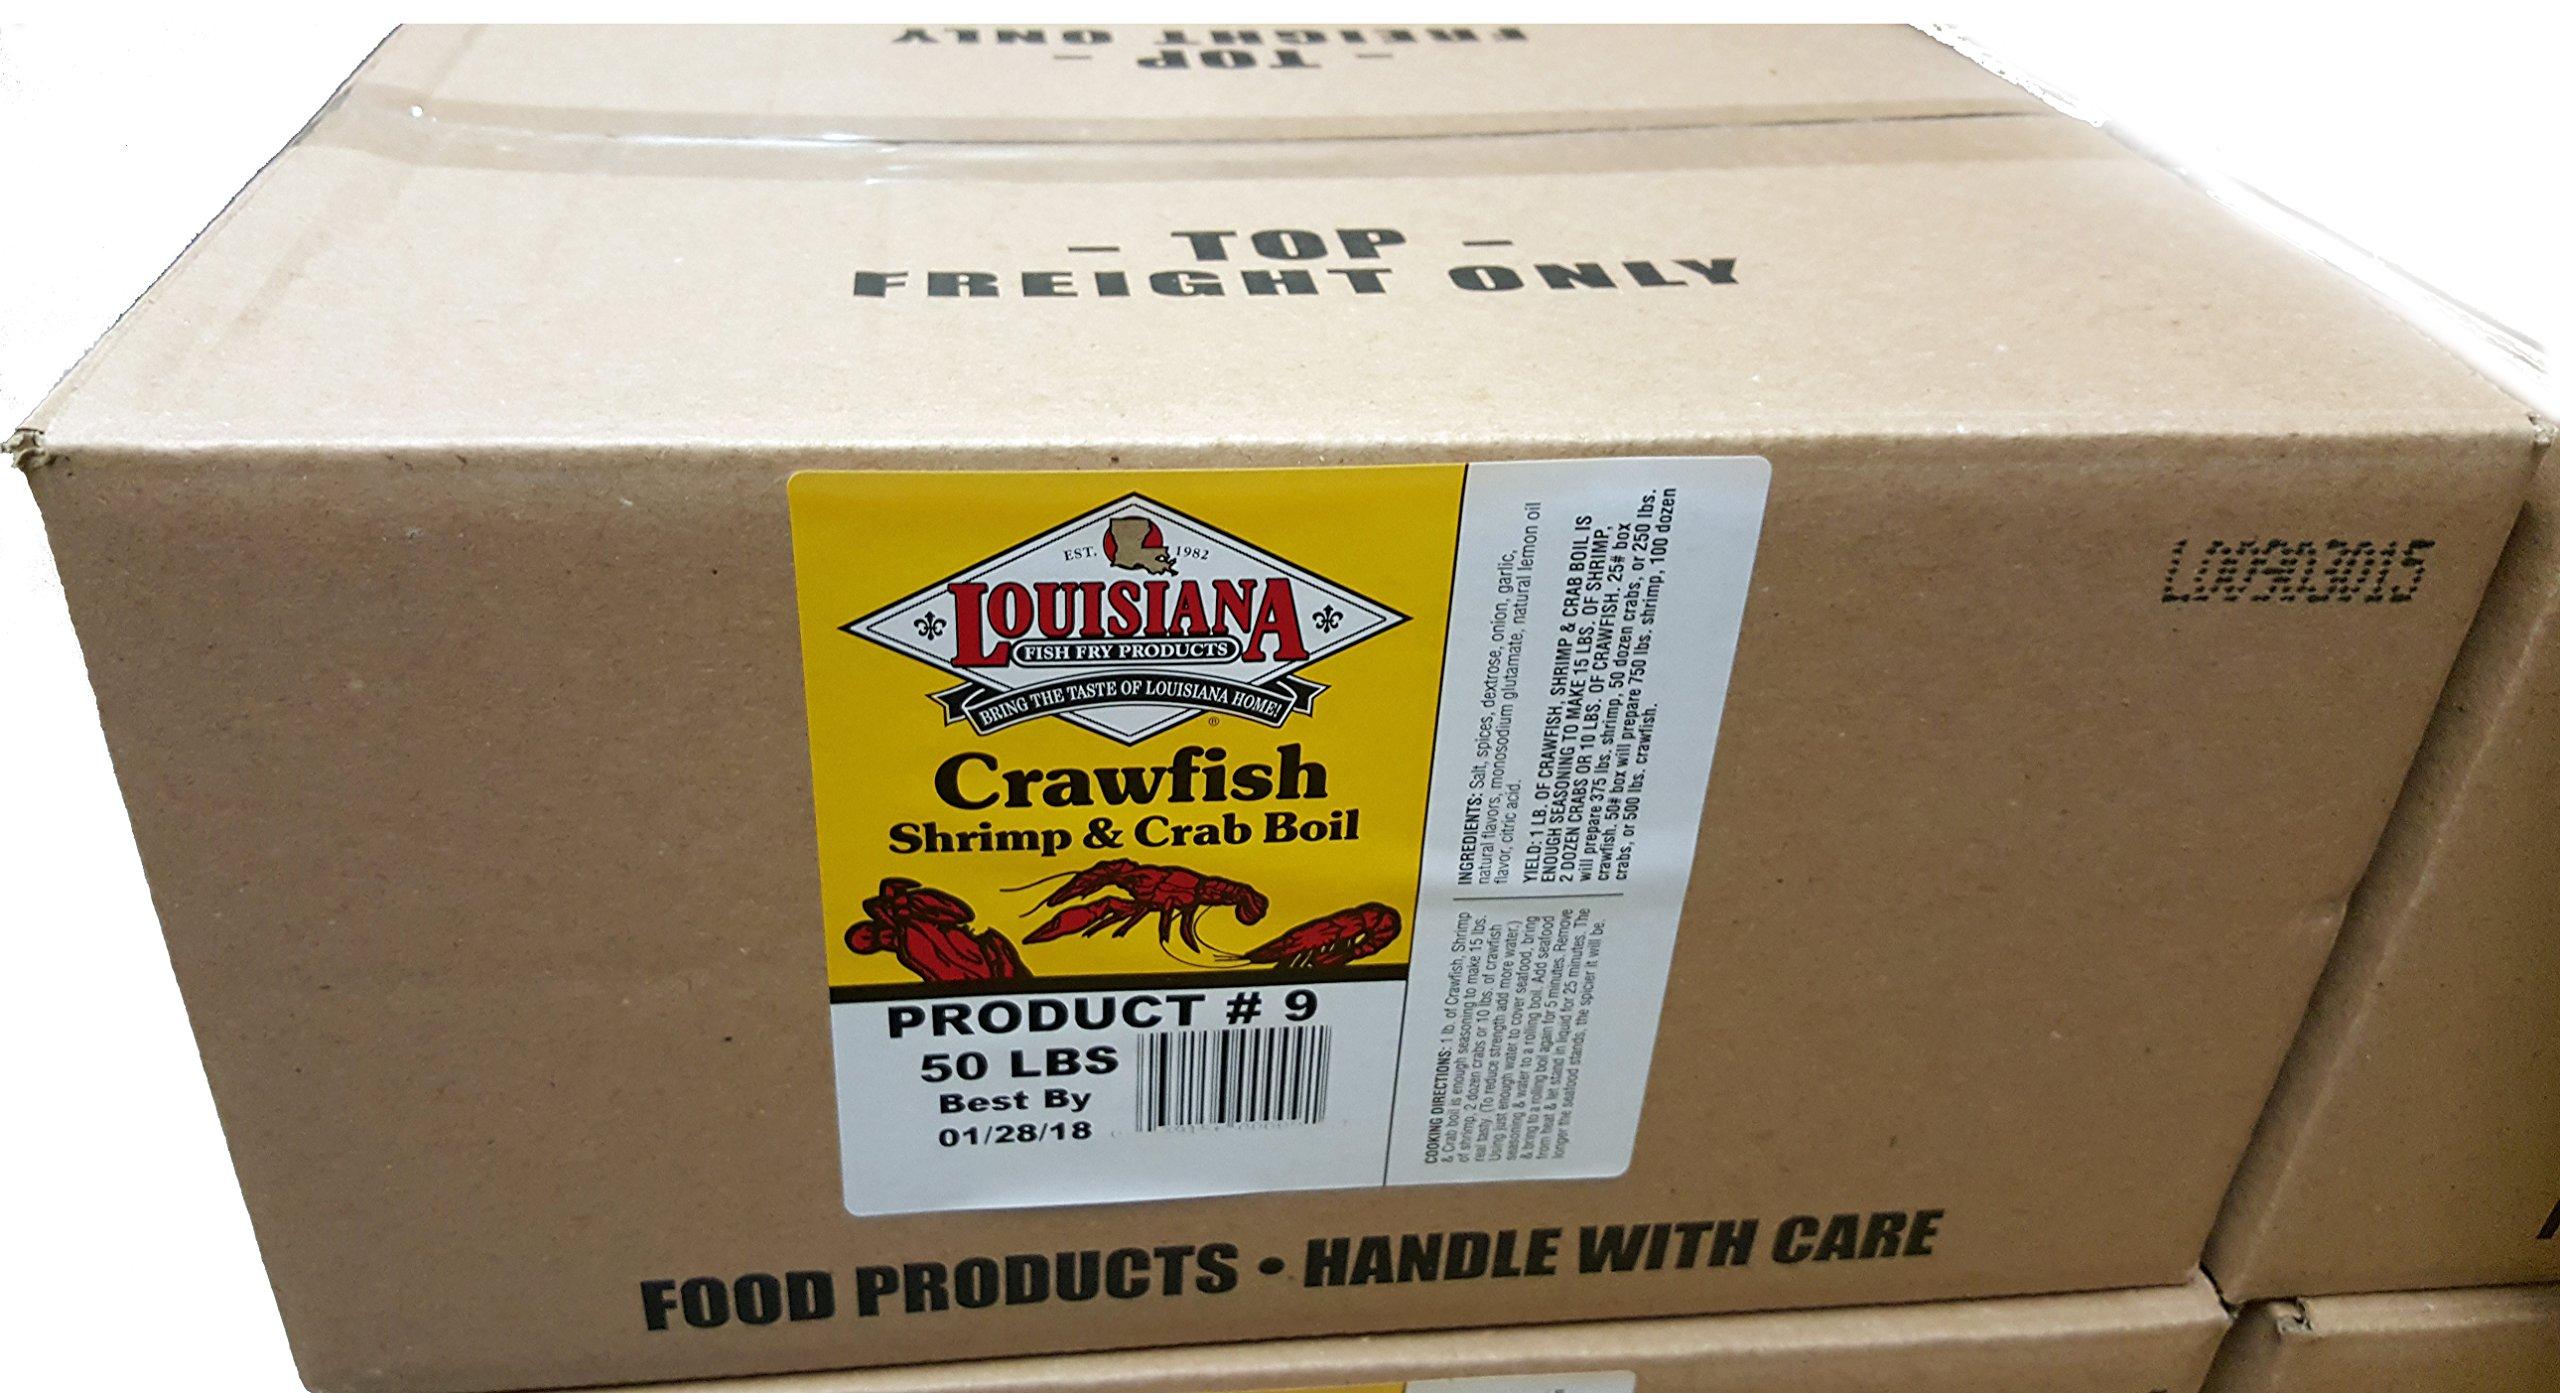 Louisiana Fish Fry Crawfish, Shrimp & Crab Boil seasoning 50lb BULK (50 Pounds)